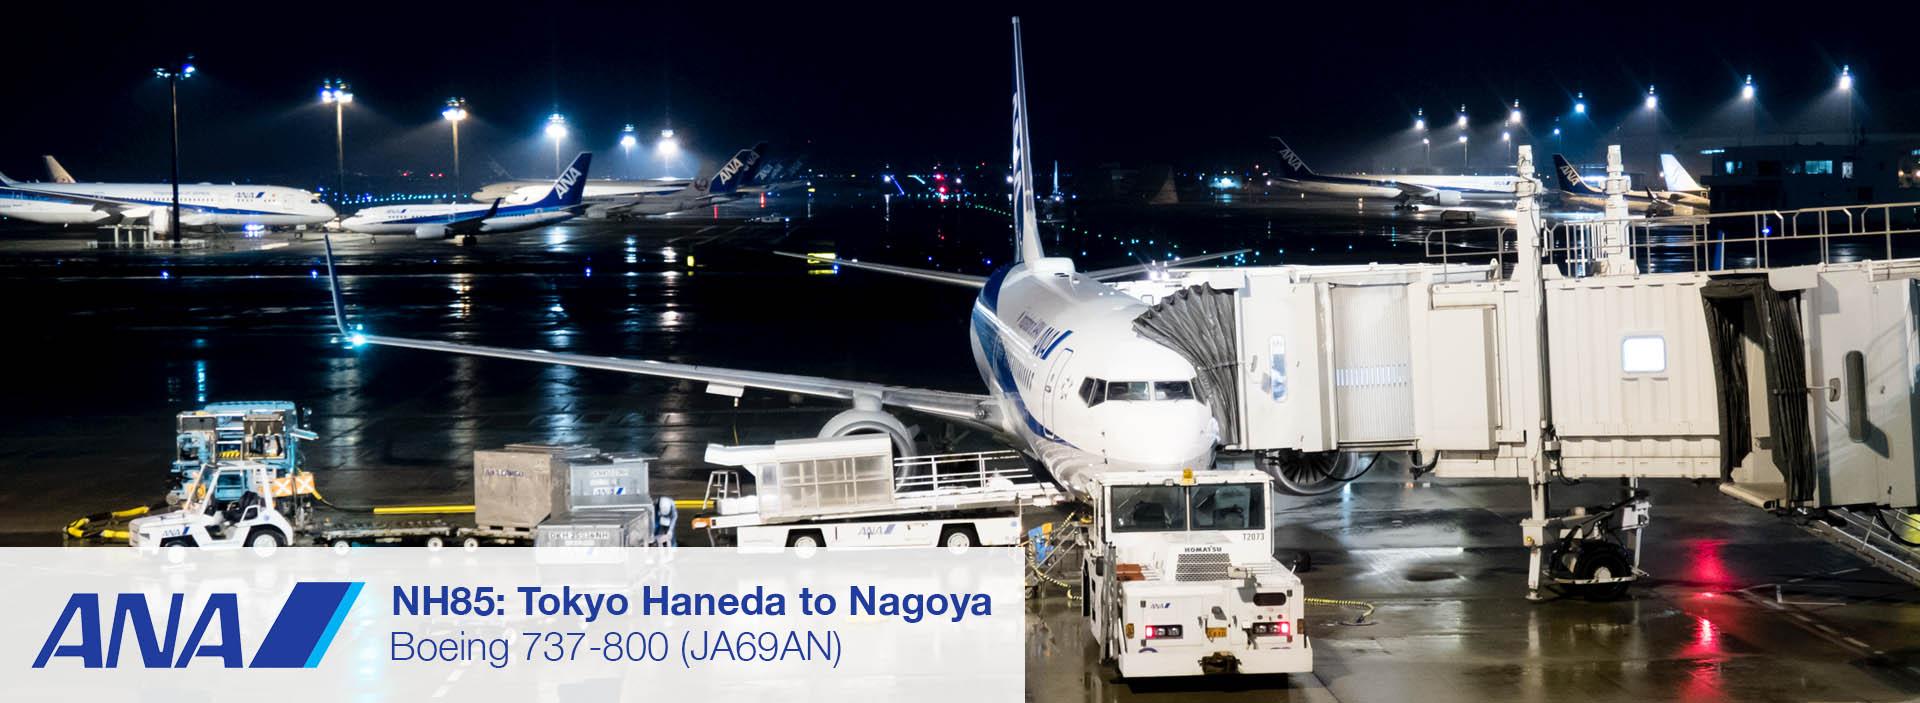 ANA Boeing 737-800 Domestic Economy Class (Tokyo - Nagoya) Review